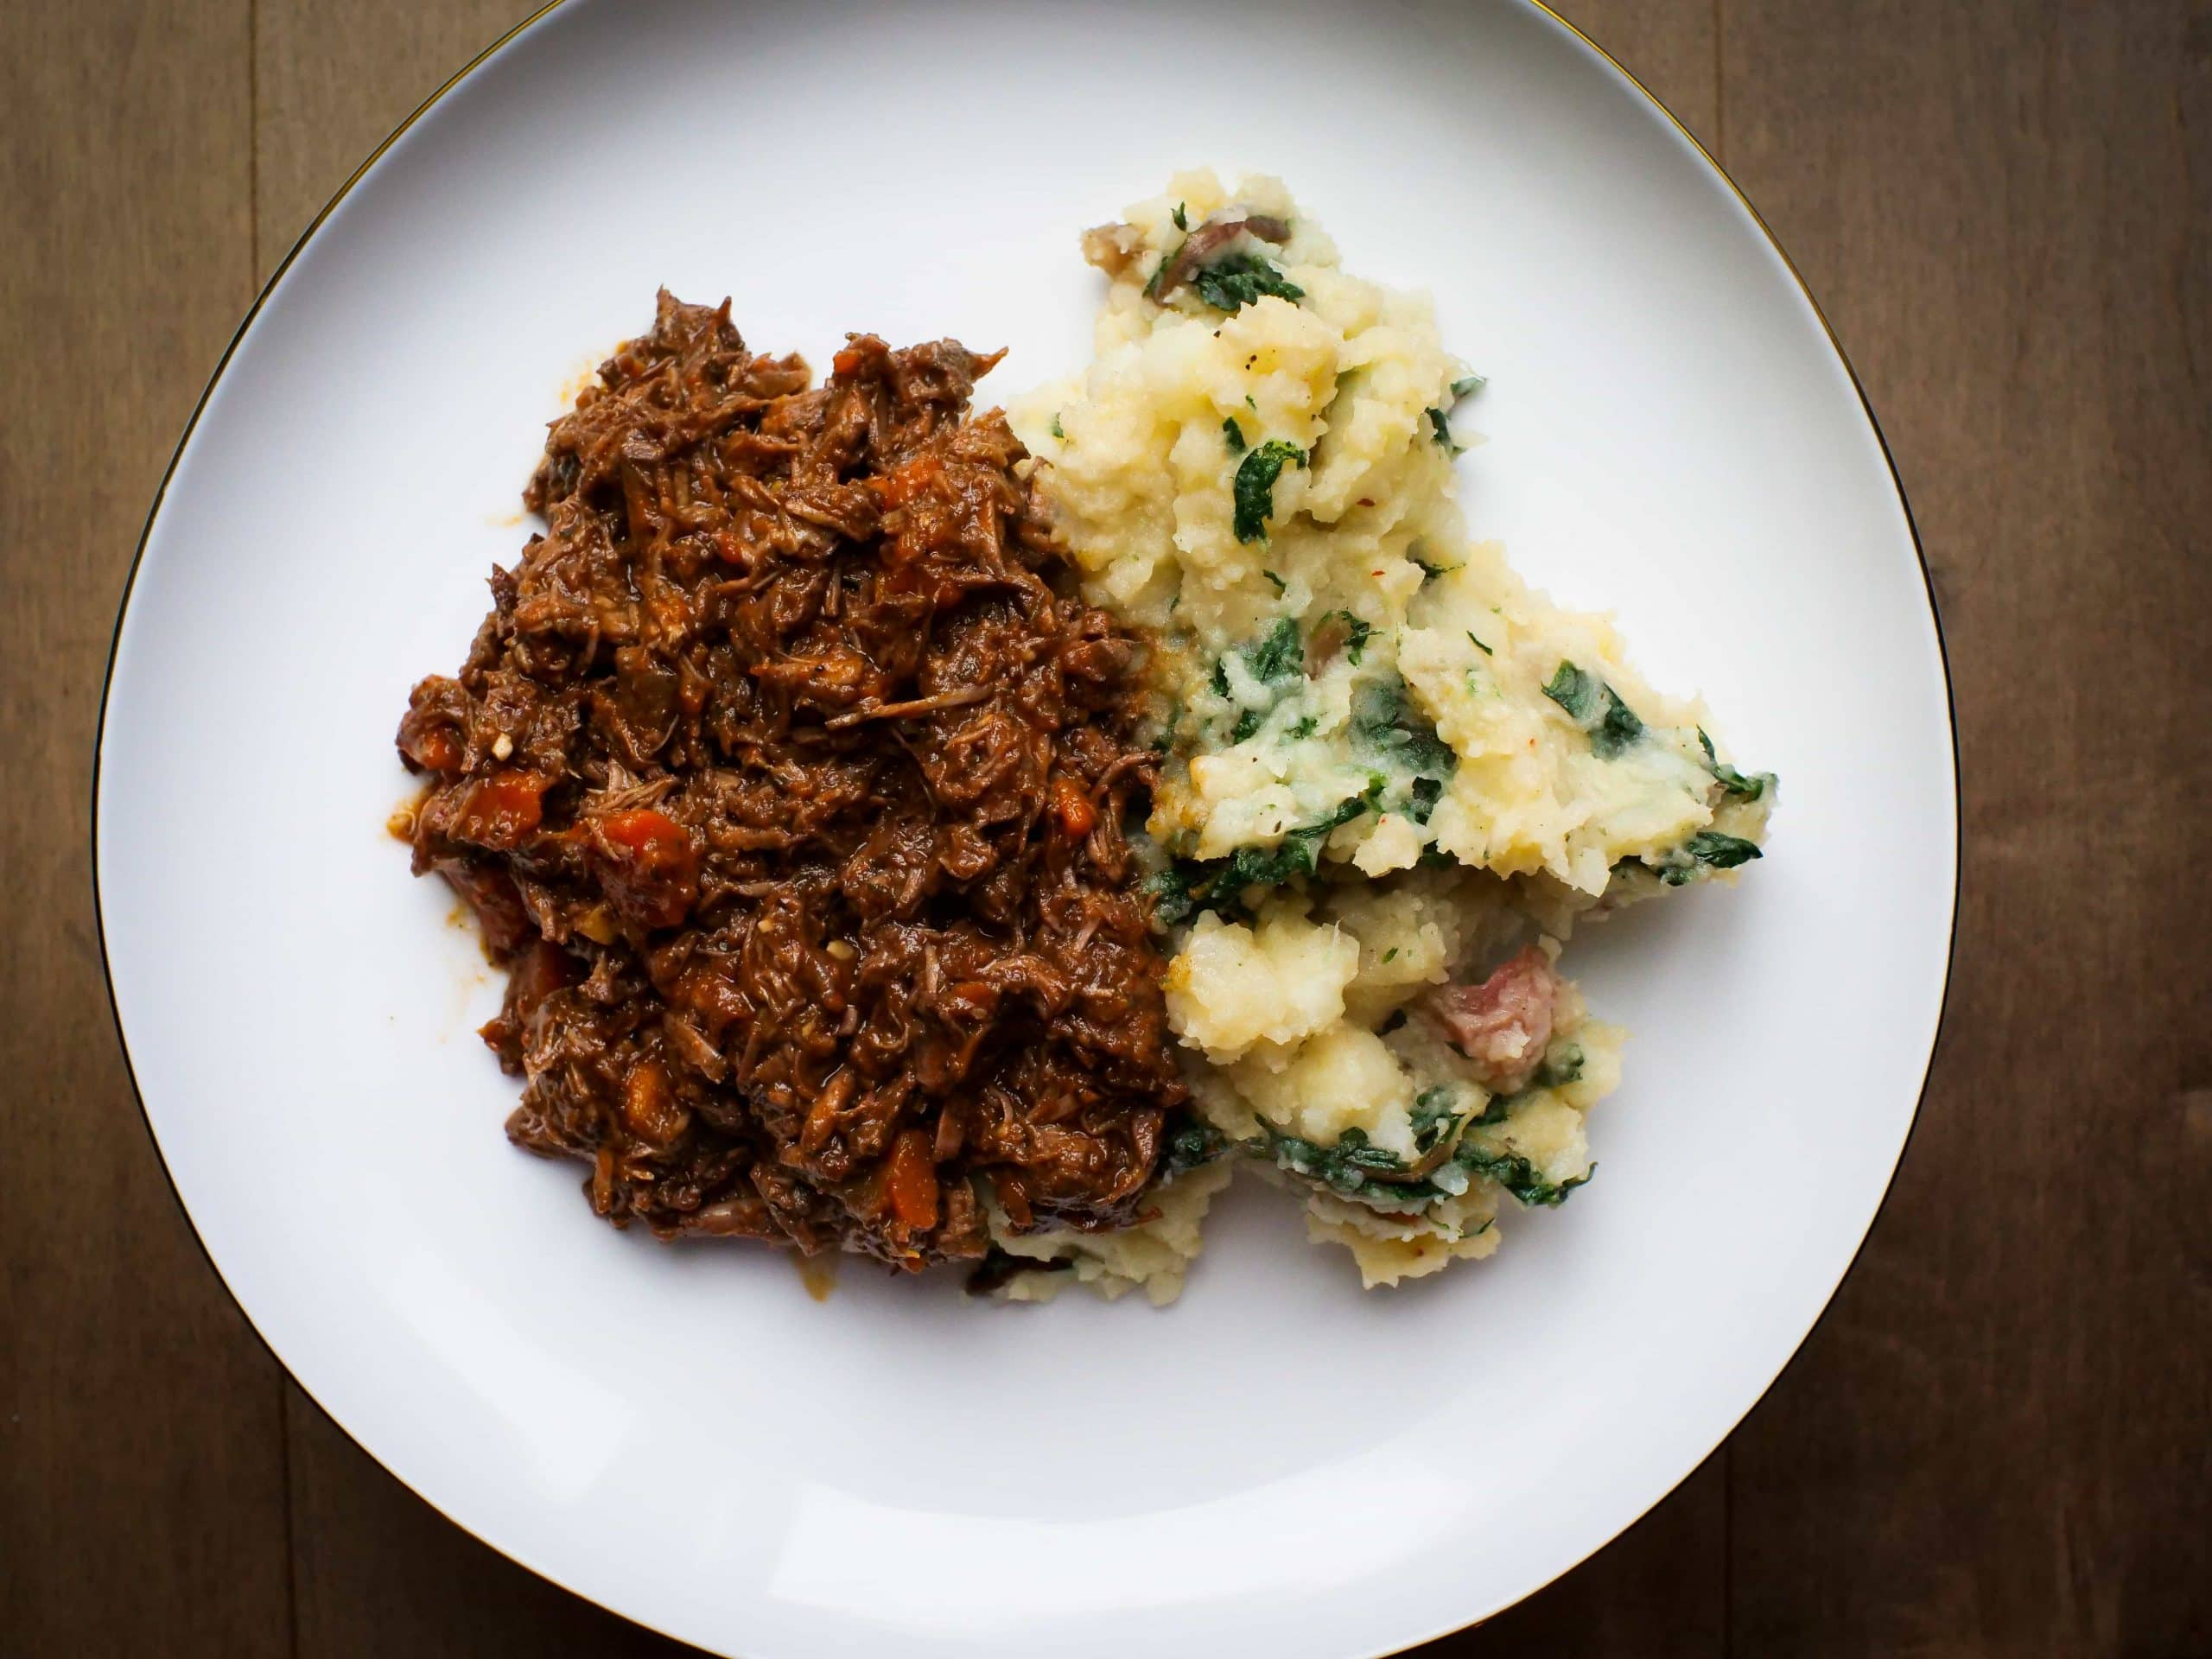 moose shoulder ragu sauce on plate served with blitva potato recipe